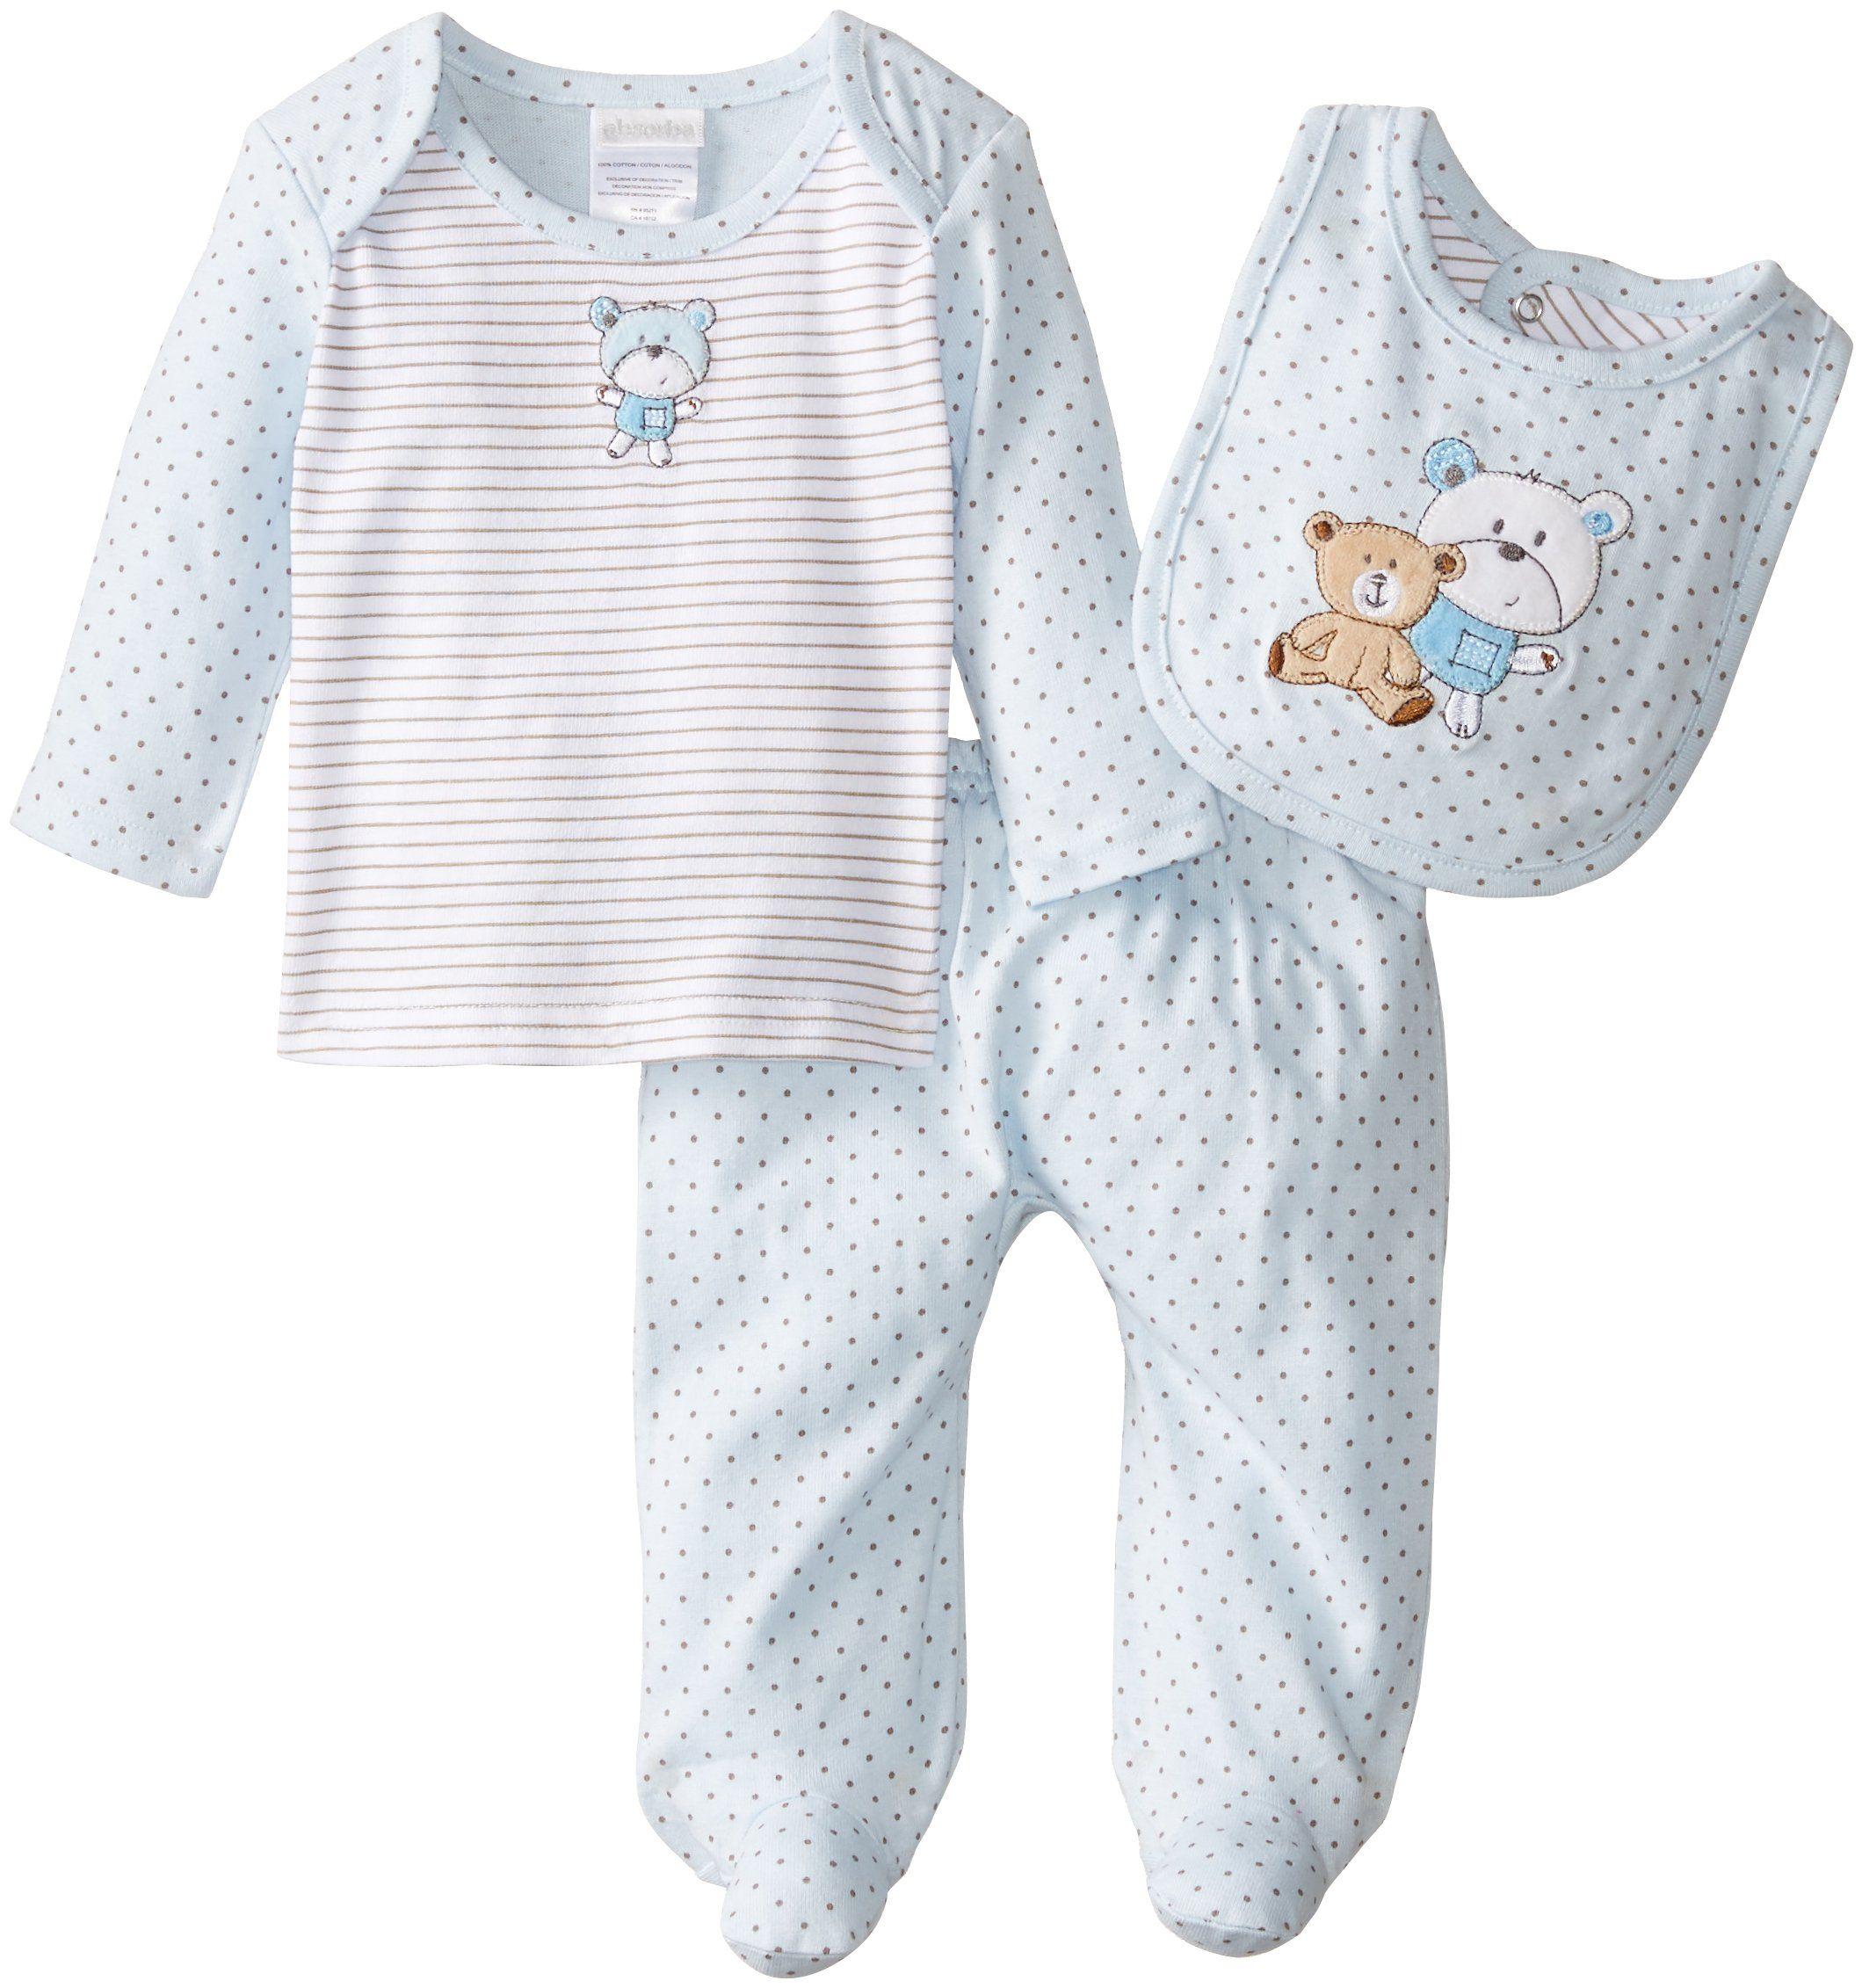 133478c3ab82 Amazon.com  ABSORBA Baby-Boys Newborn Brother Bear 3 Piece Footed ...